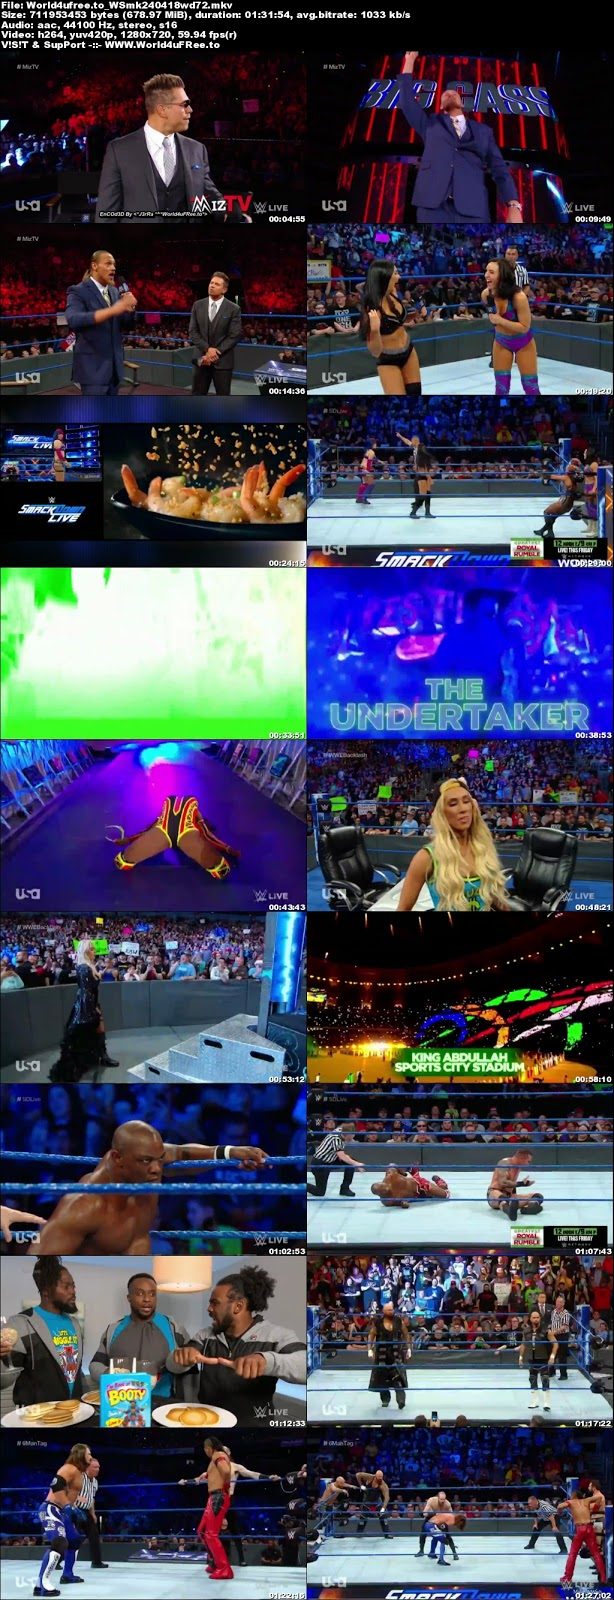 WWE Smackdown Live 24 April 2018 720p HDTV 700MB x264 World4ufree.to_WSmk240418wd72